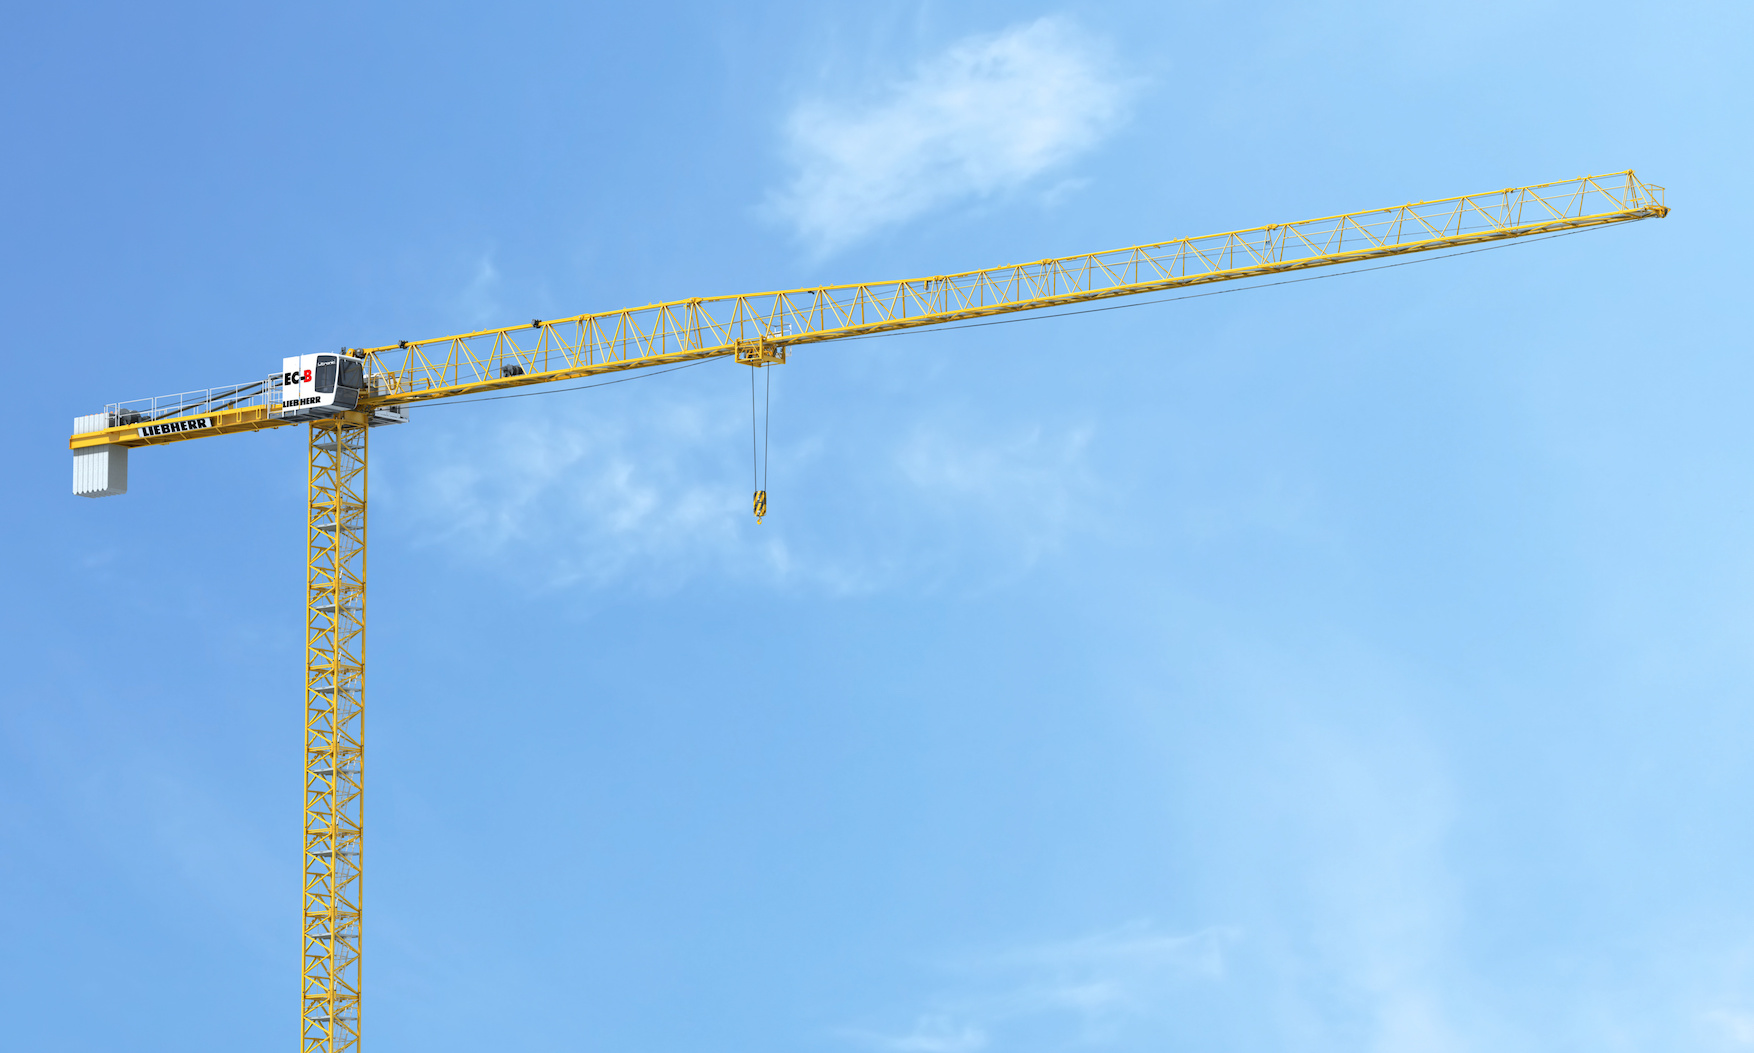 liebherr-flat-top-crane-172ec-b-300dpi - copie